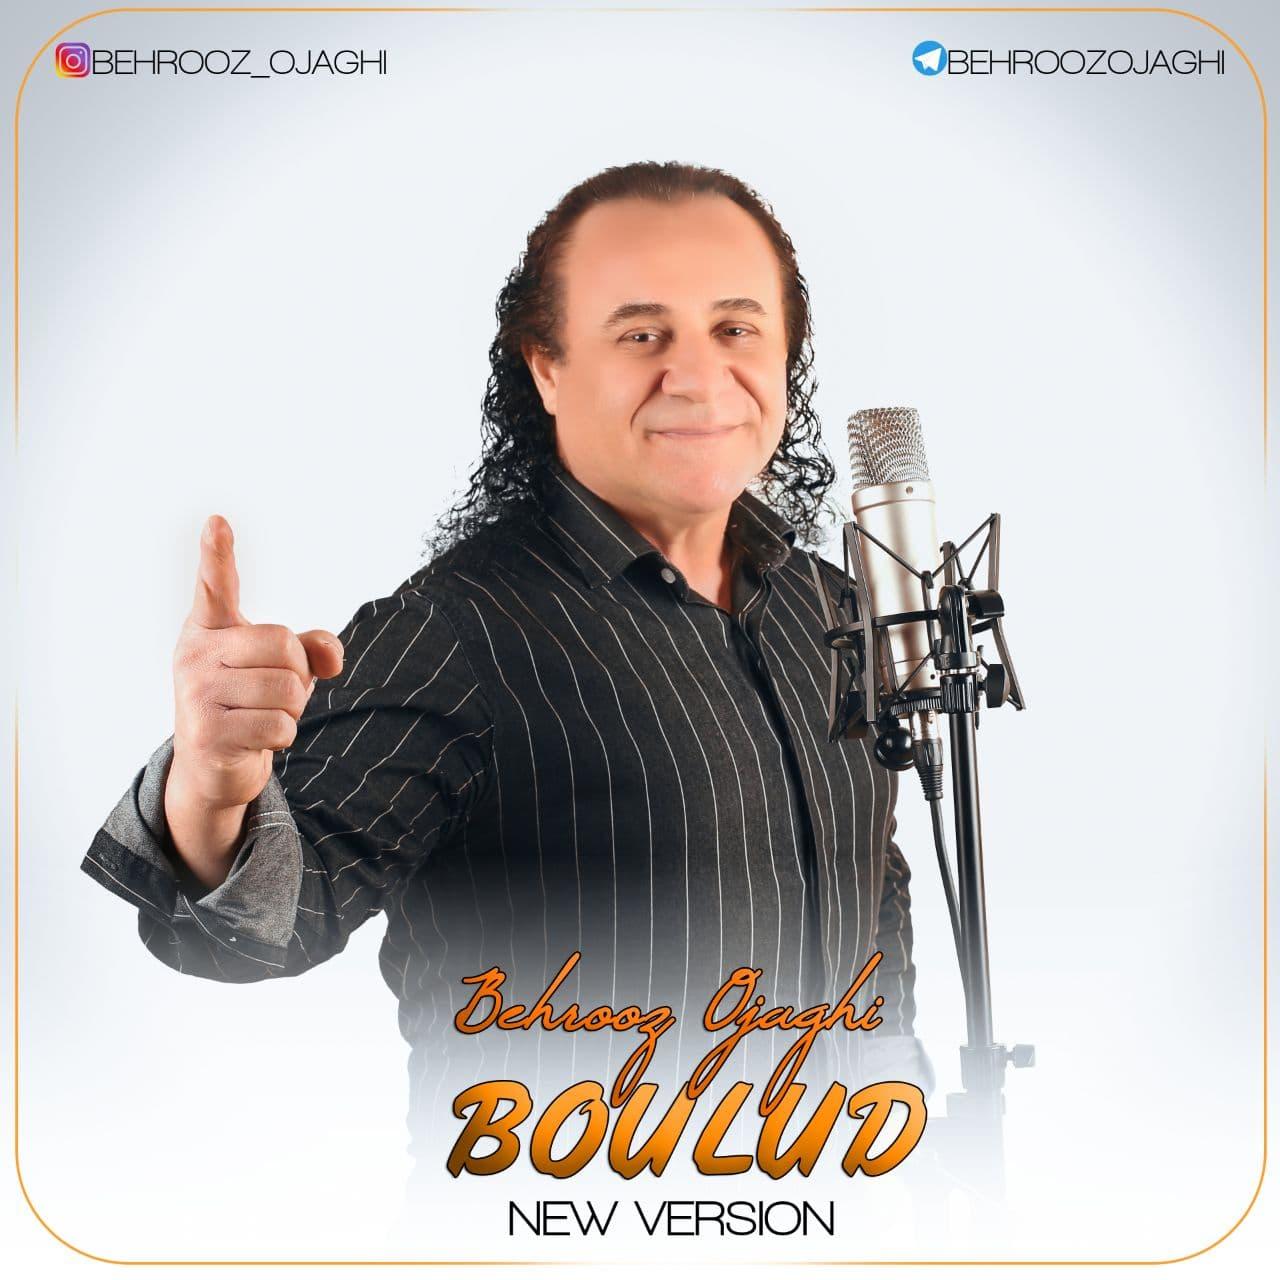 https://s19.picofile.com/file/8438831618/02Behrooz_Ojaghi_Boulud_New_Version_.jpg